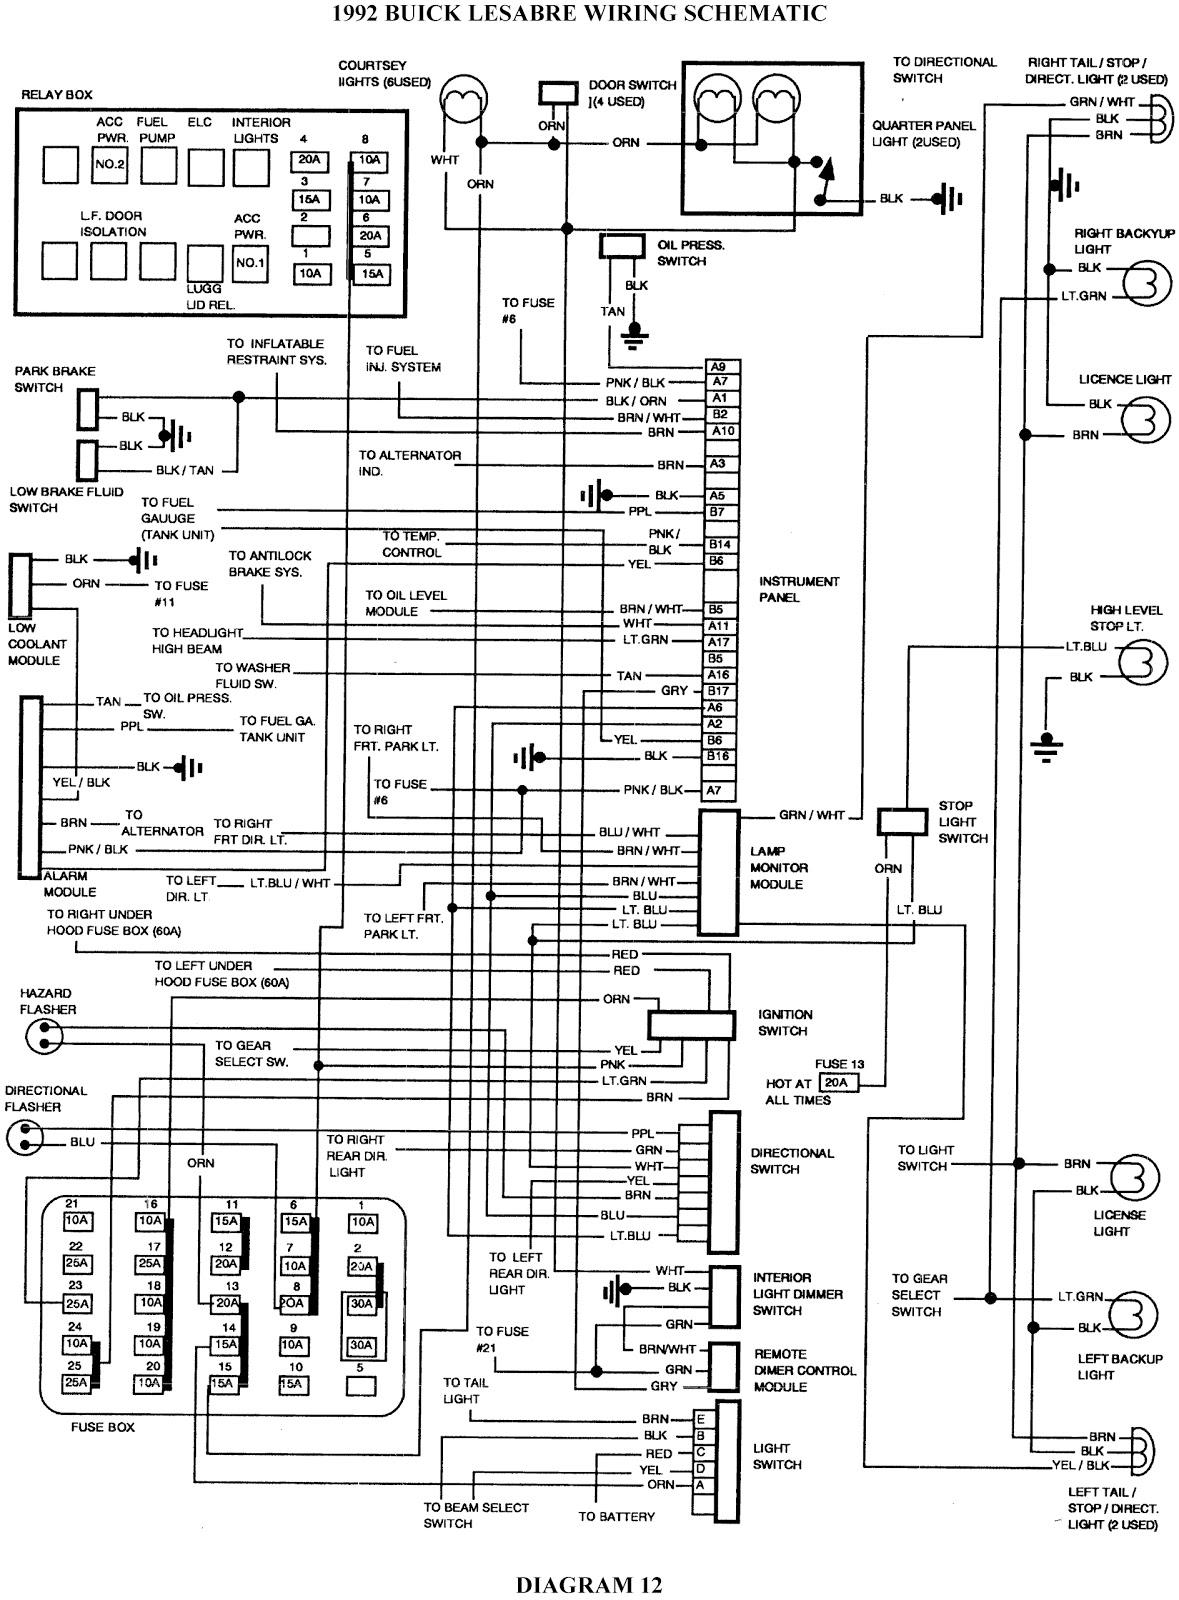 1994 Buick Lesabre Wiring Diagram Free Picture - Wiring Diagrams Schema  elite - elite.wheeladvisor.it